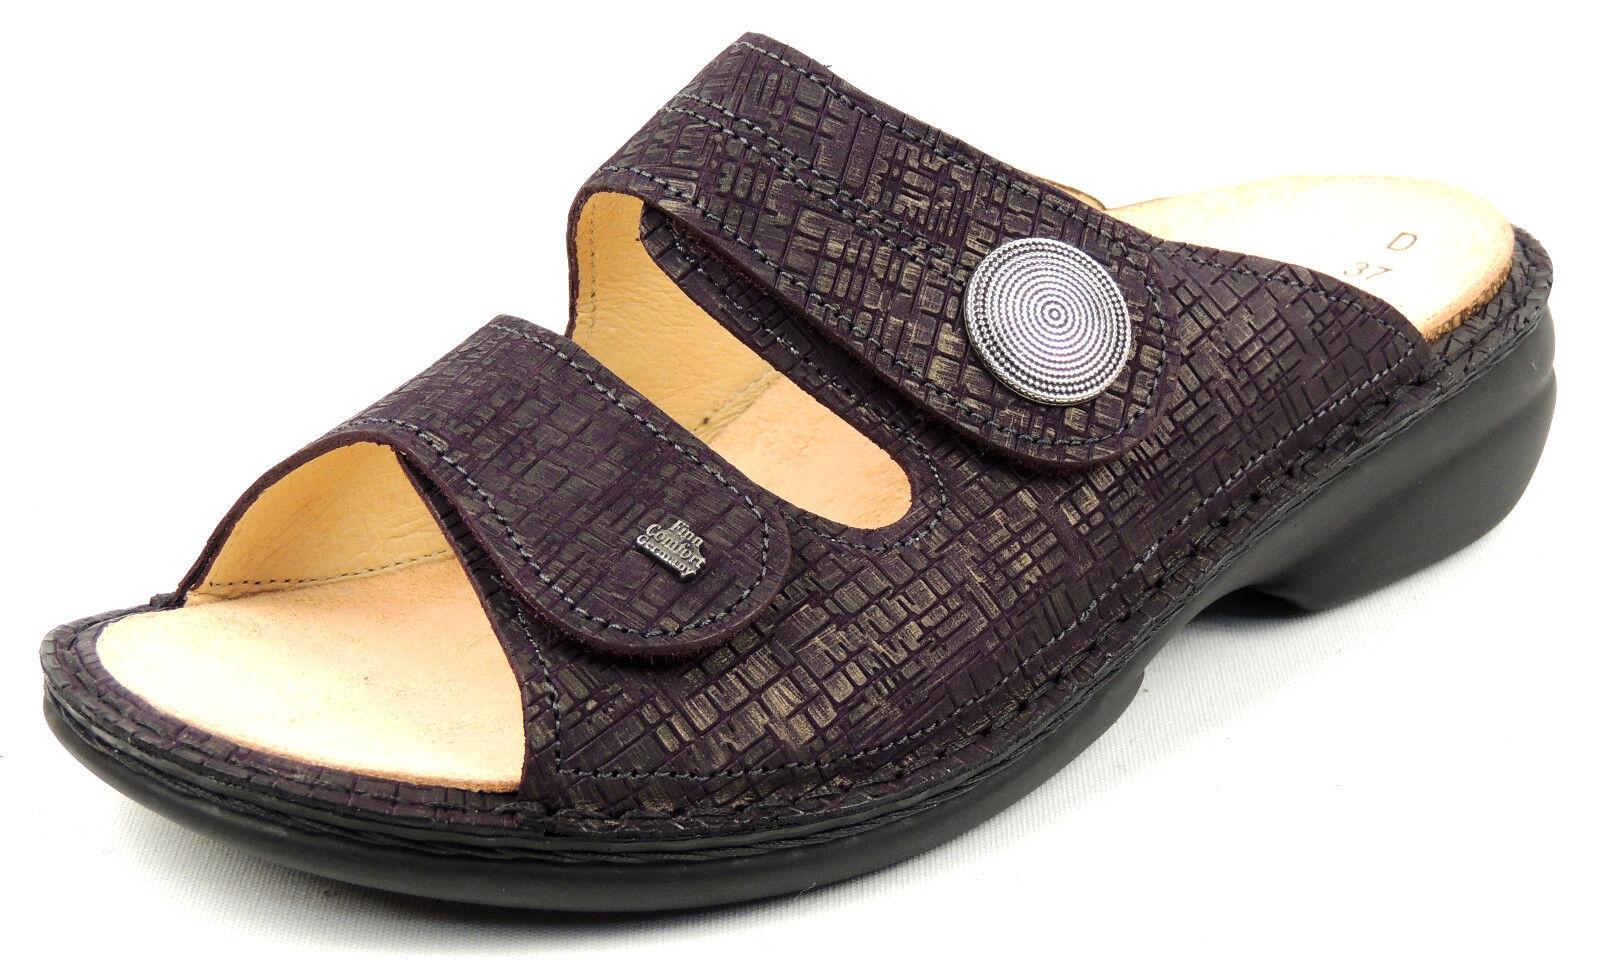 Finn Comfort Femmes Mules  zanzibar  2558 violet taille 36 - 41